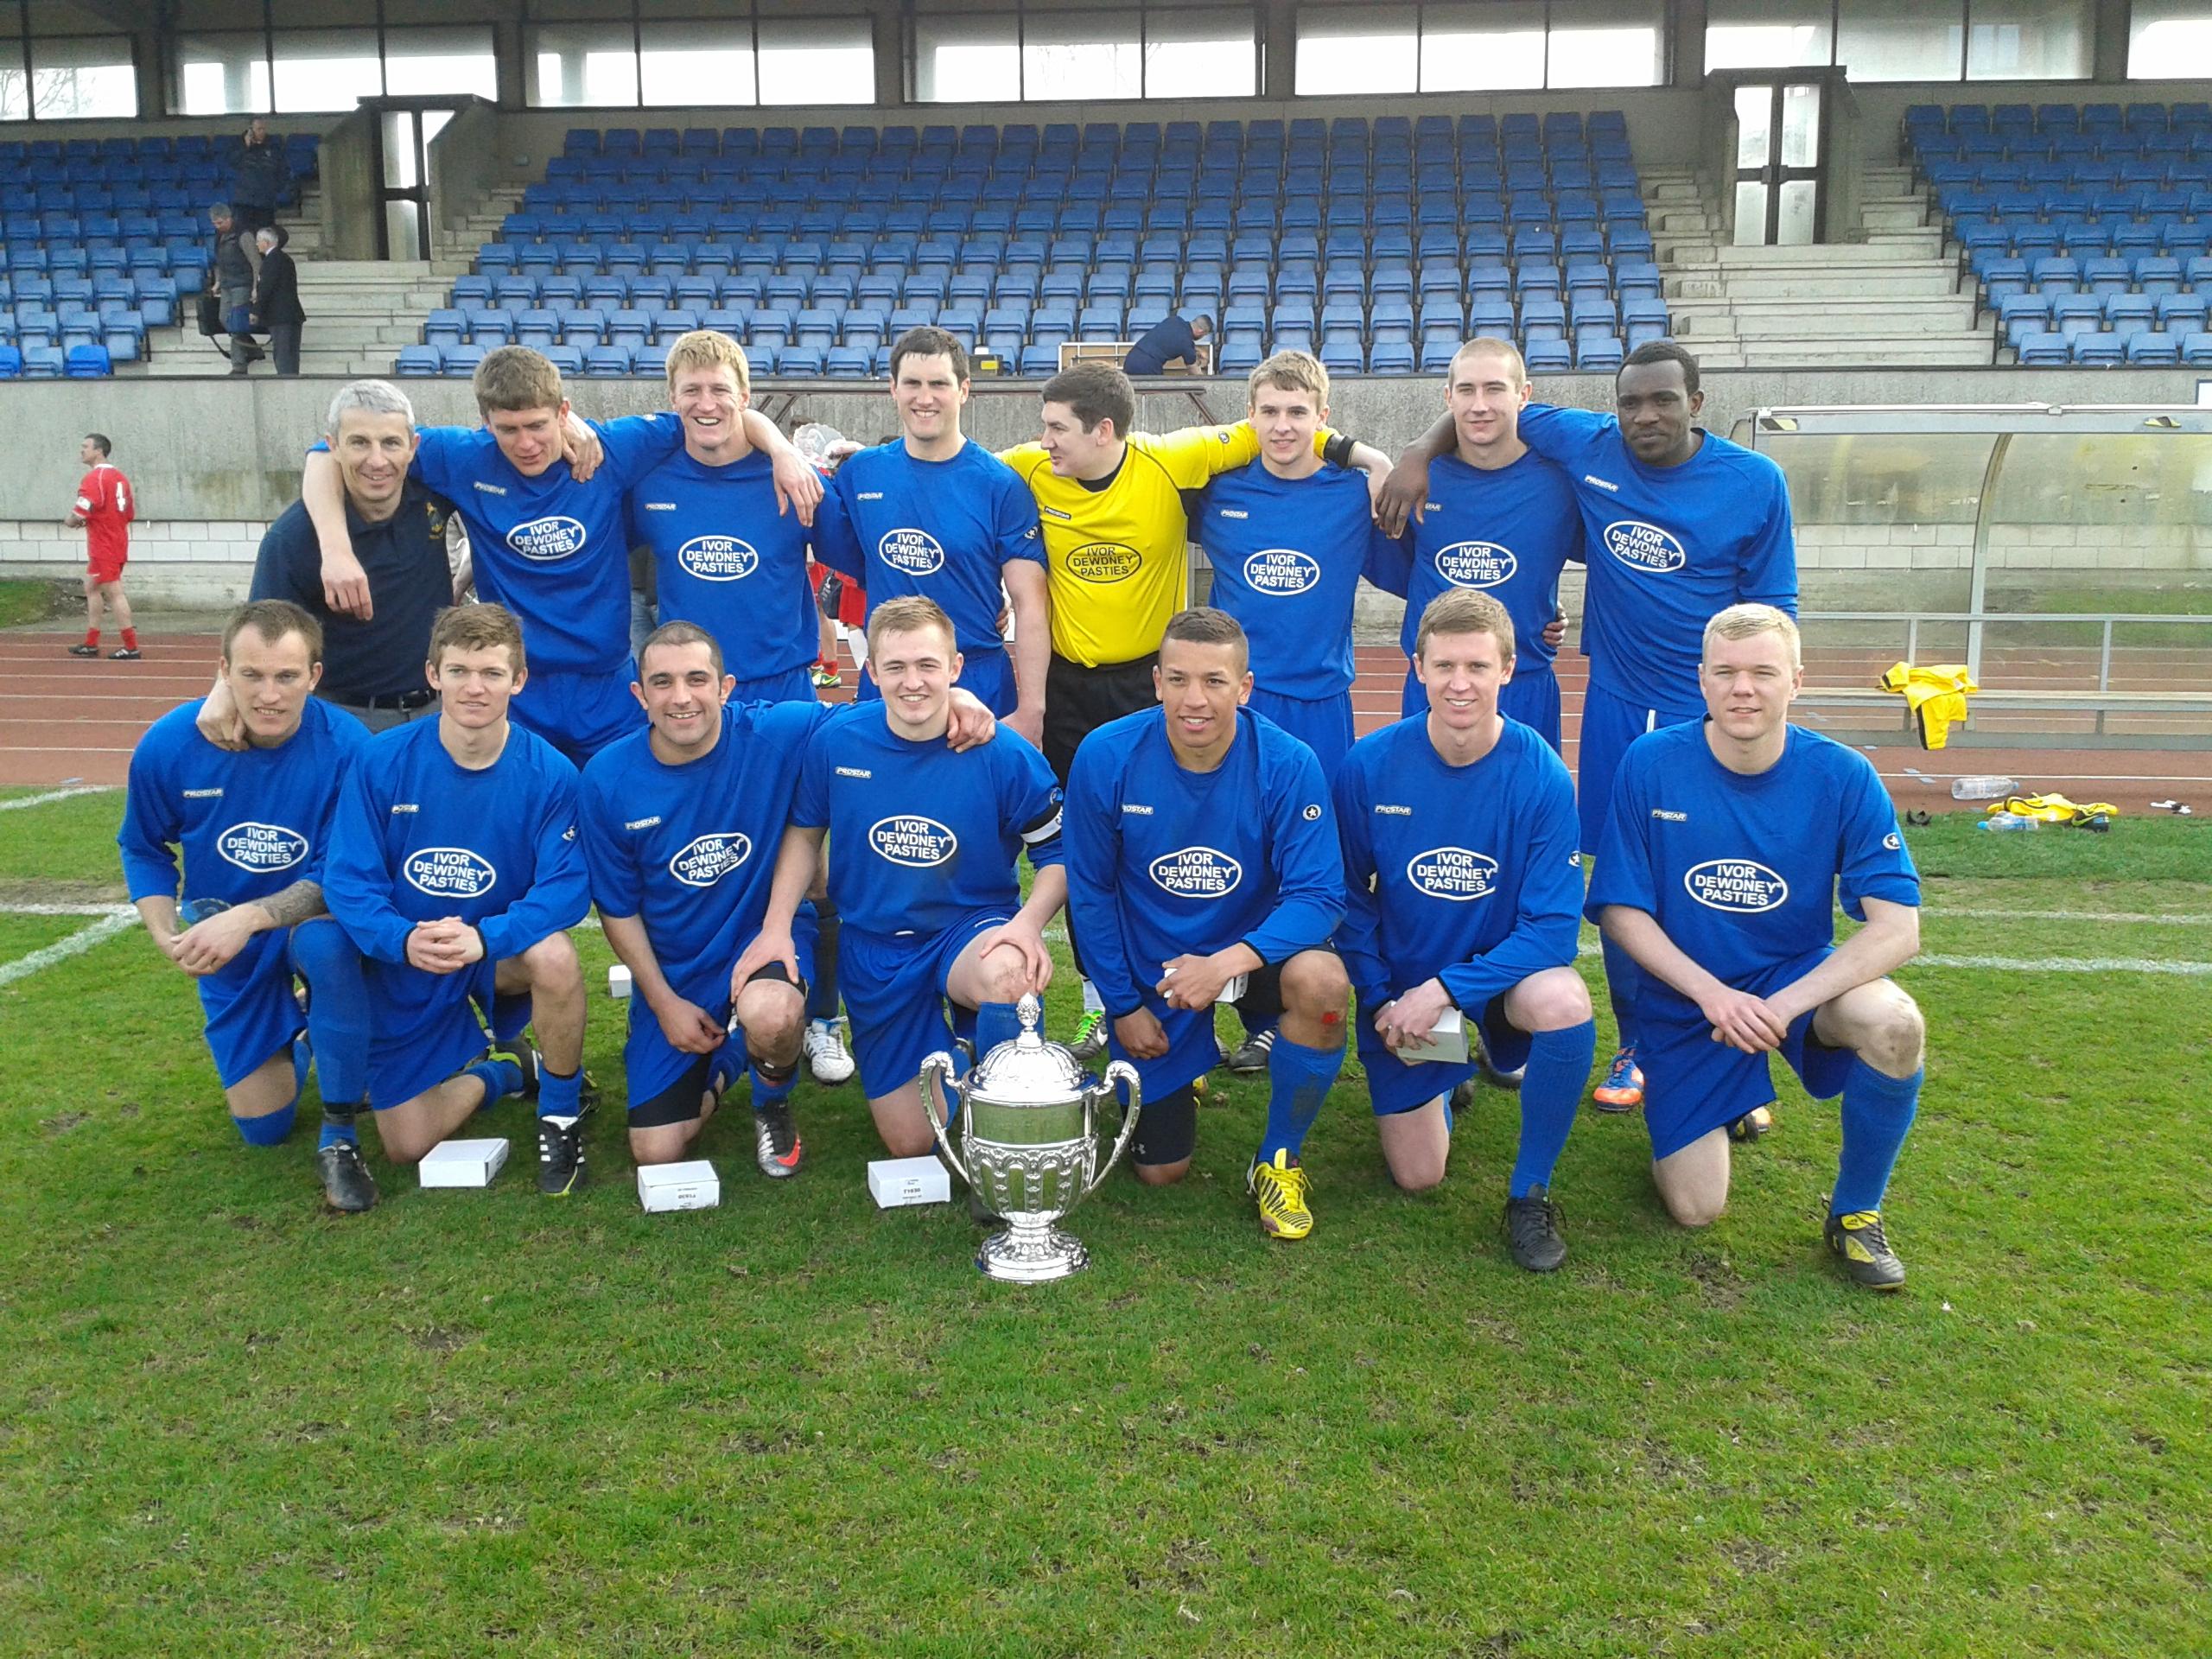 2013 Navy Cup Winners 43Cdo RM